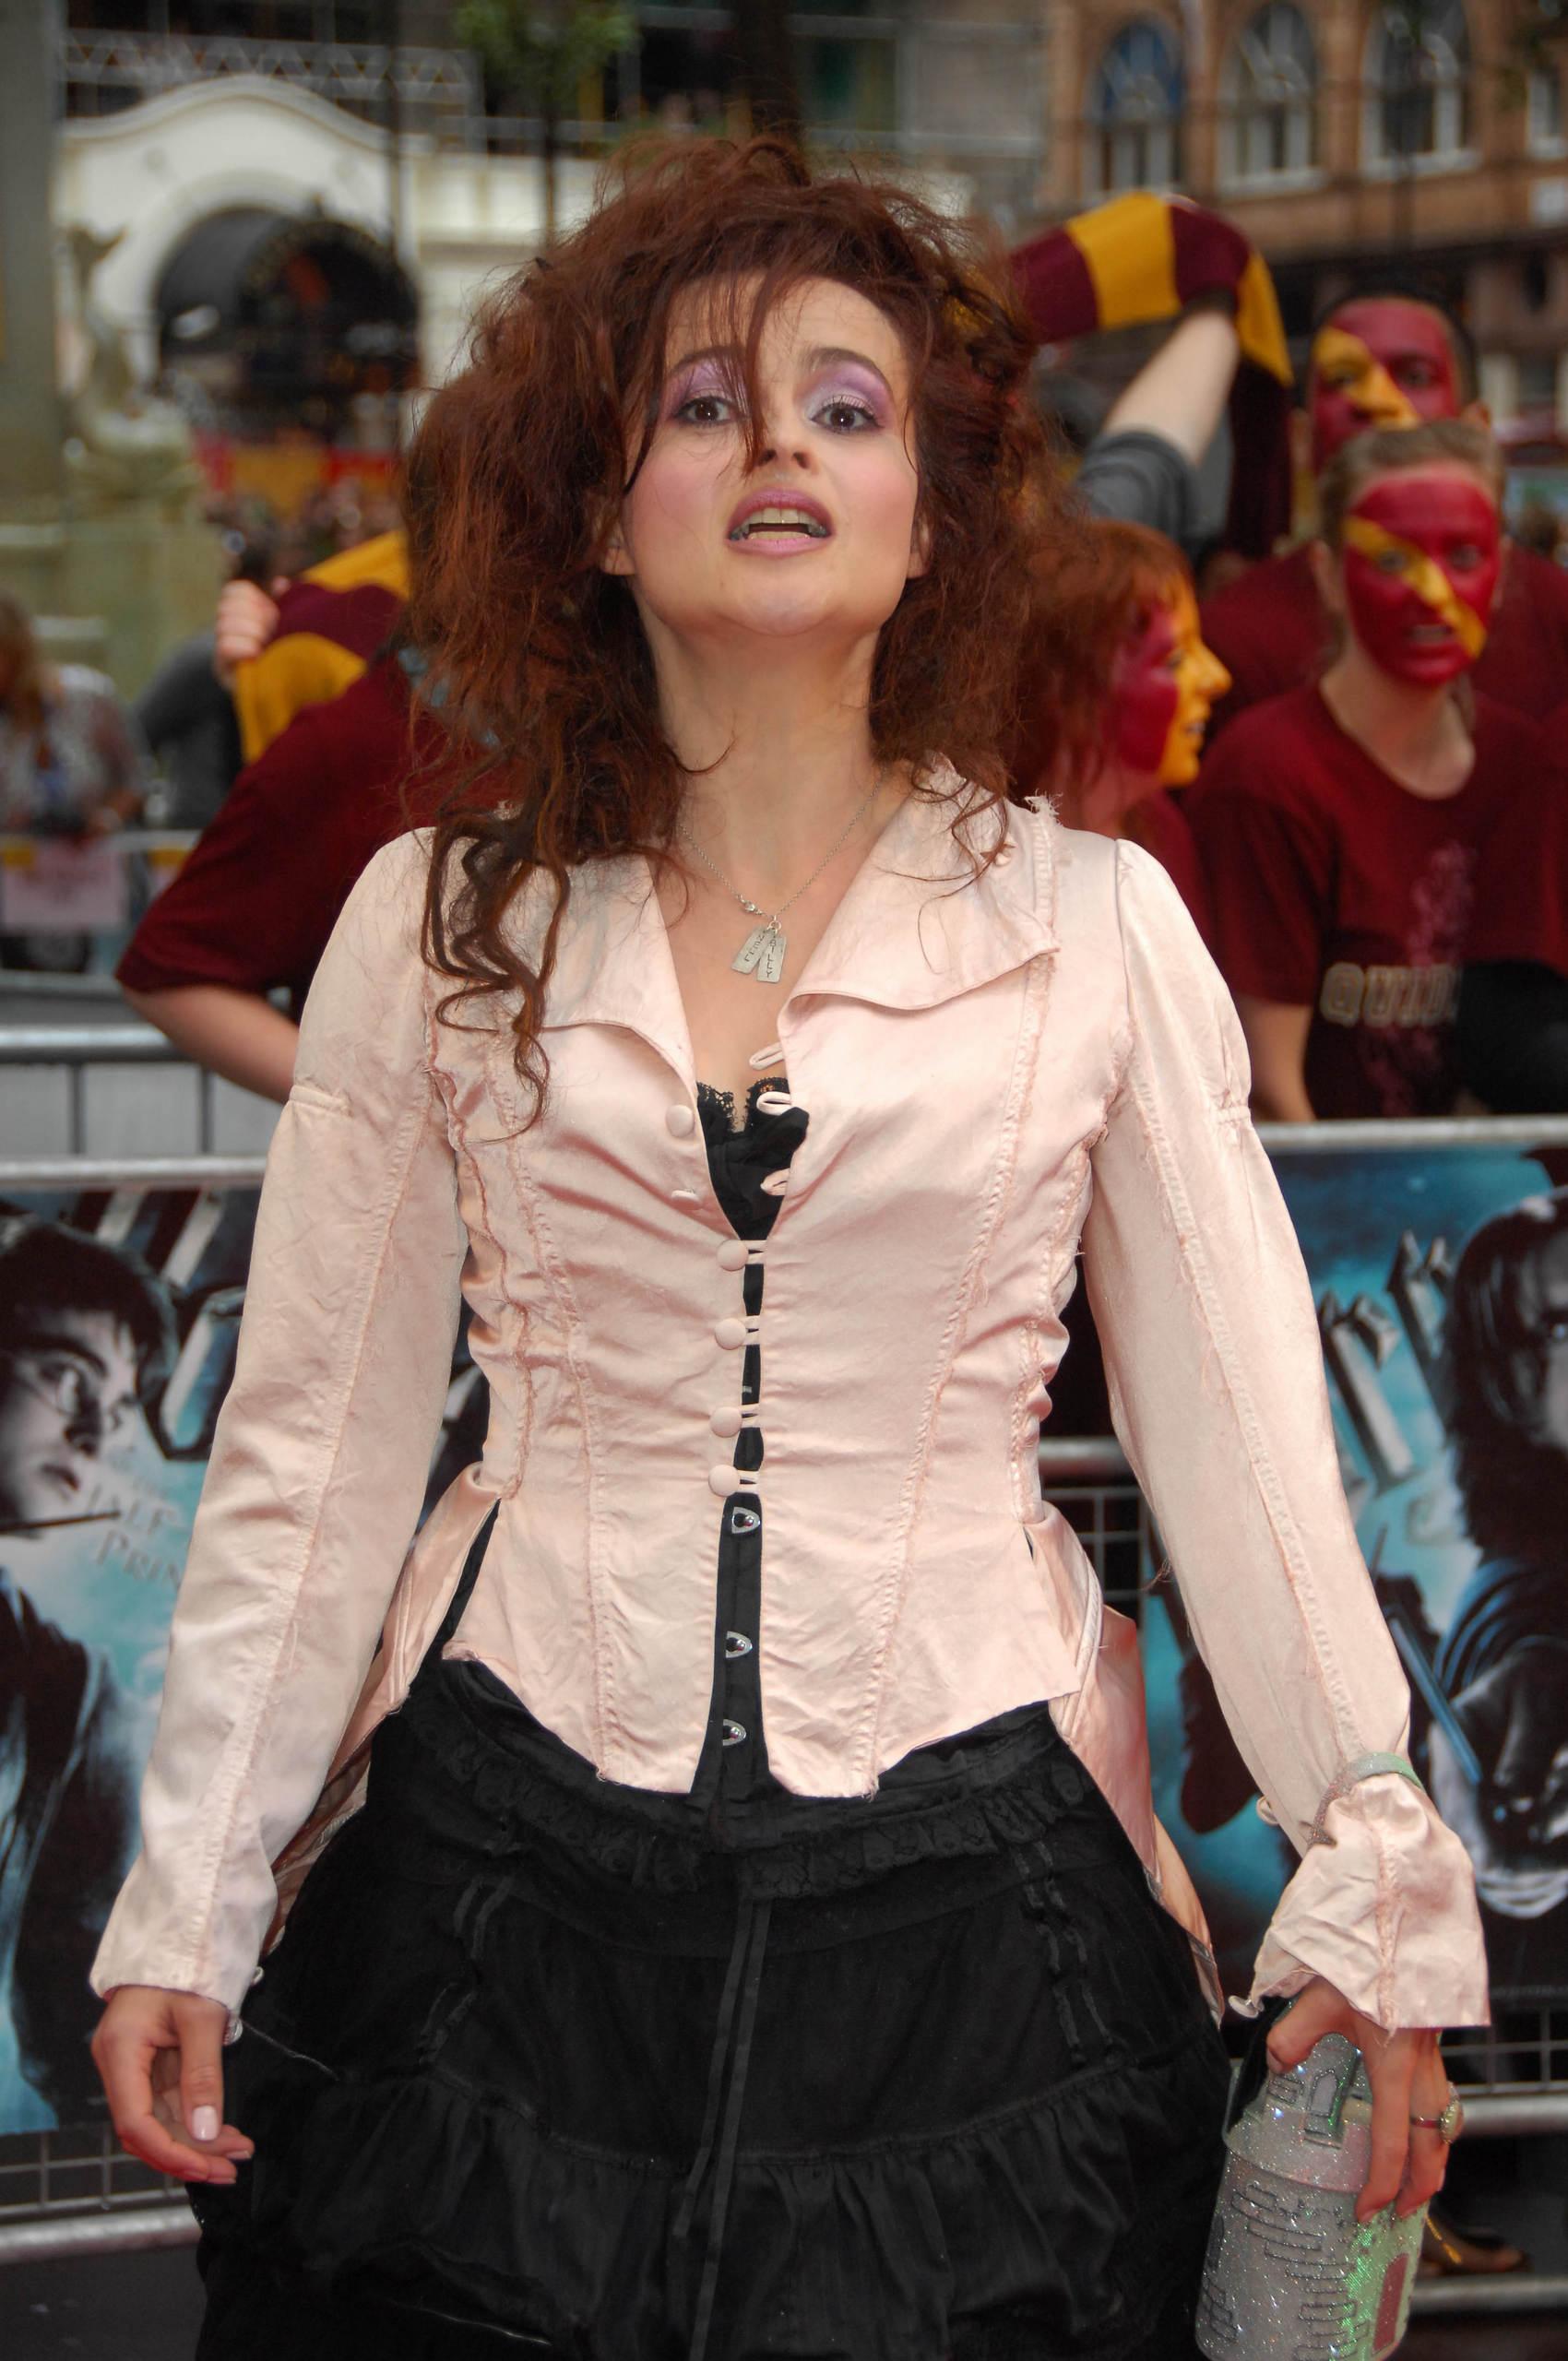 Helena Bonham Carter - Helena Bonham Carter Photo (7034960) - Fanpop Helena Bonham Carter